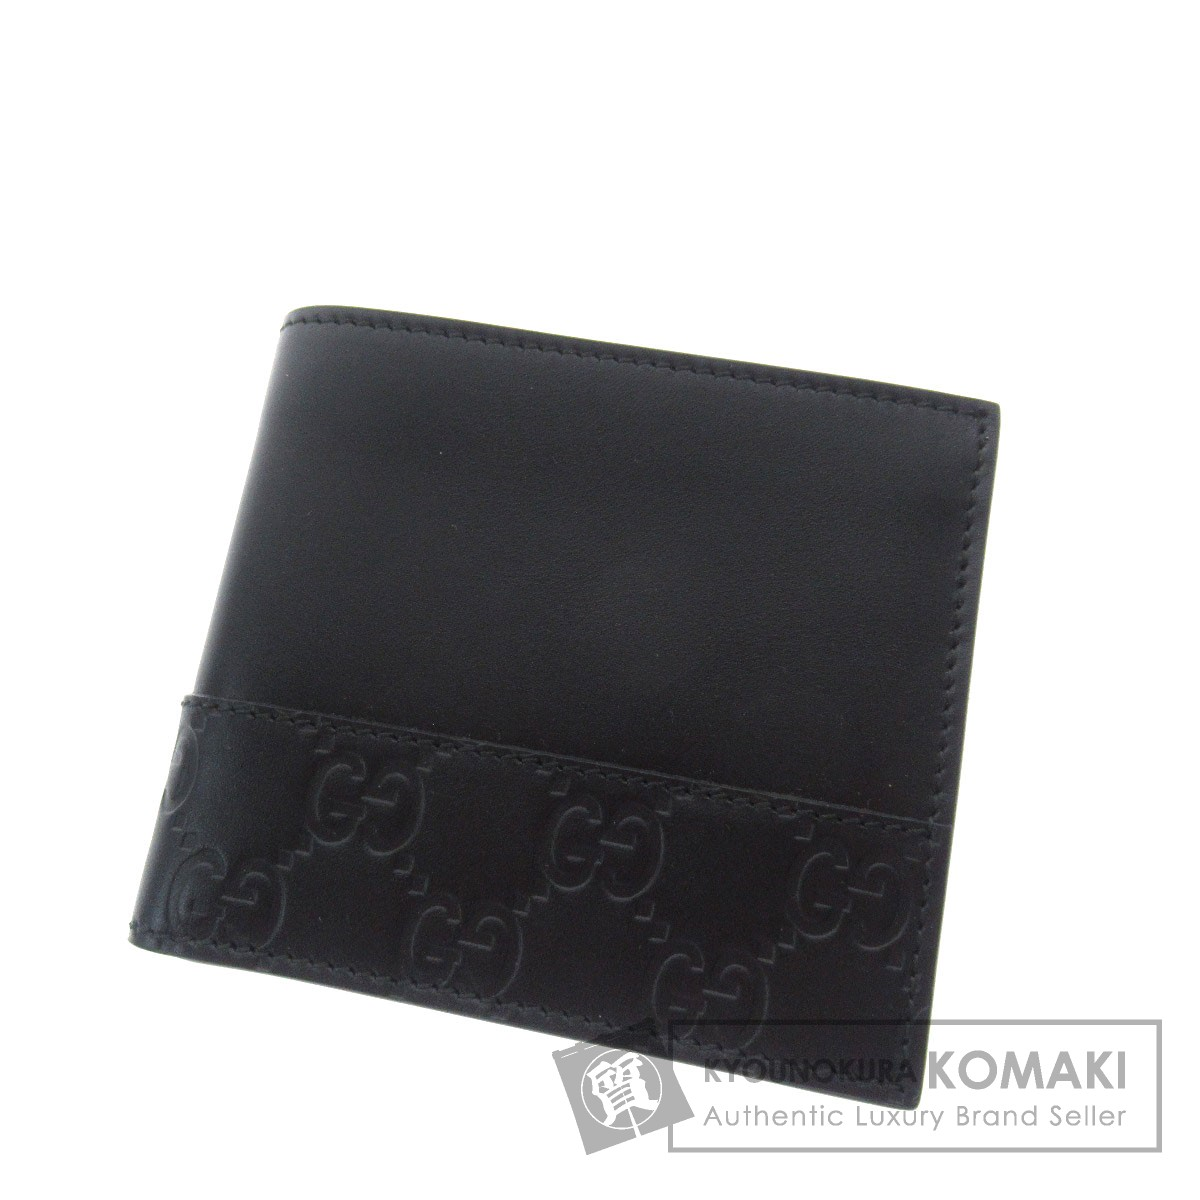 GUCCI グッチシマ 二つ折り財布(小銭入れあり) レザー メンズ 【中古】【グッチ】